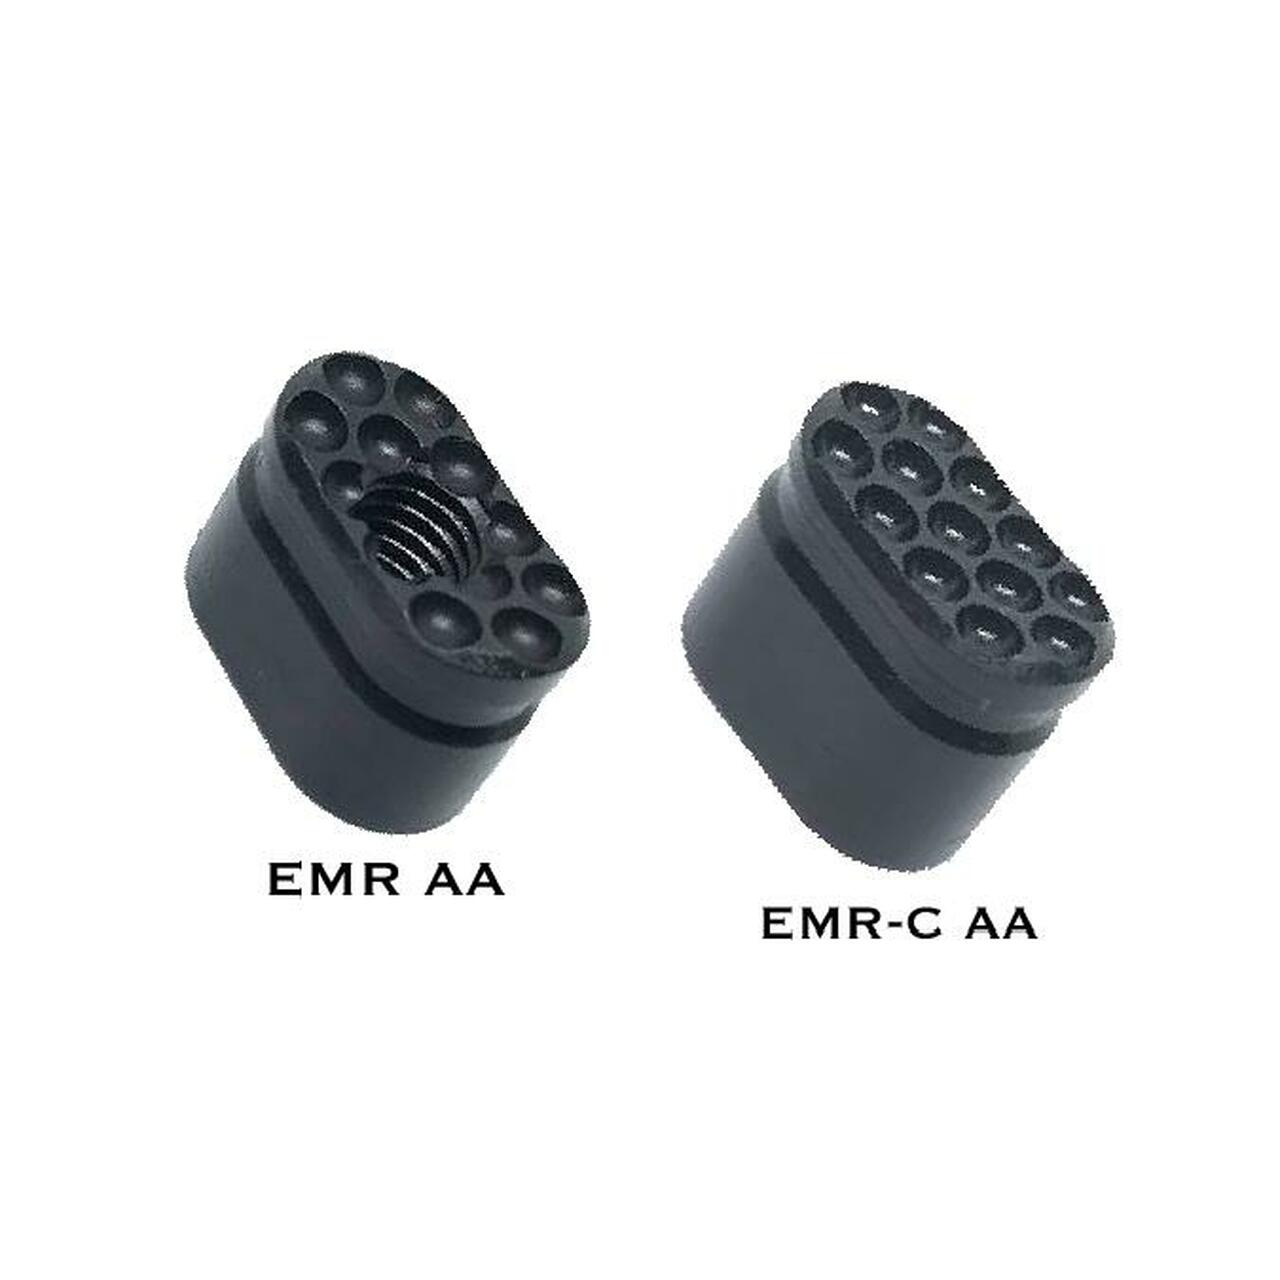 Forward Controls Design Enhanced Magazine Release (EMR) AA